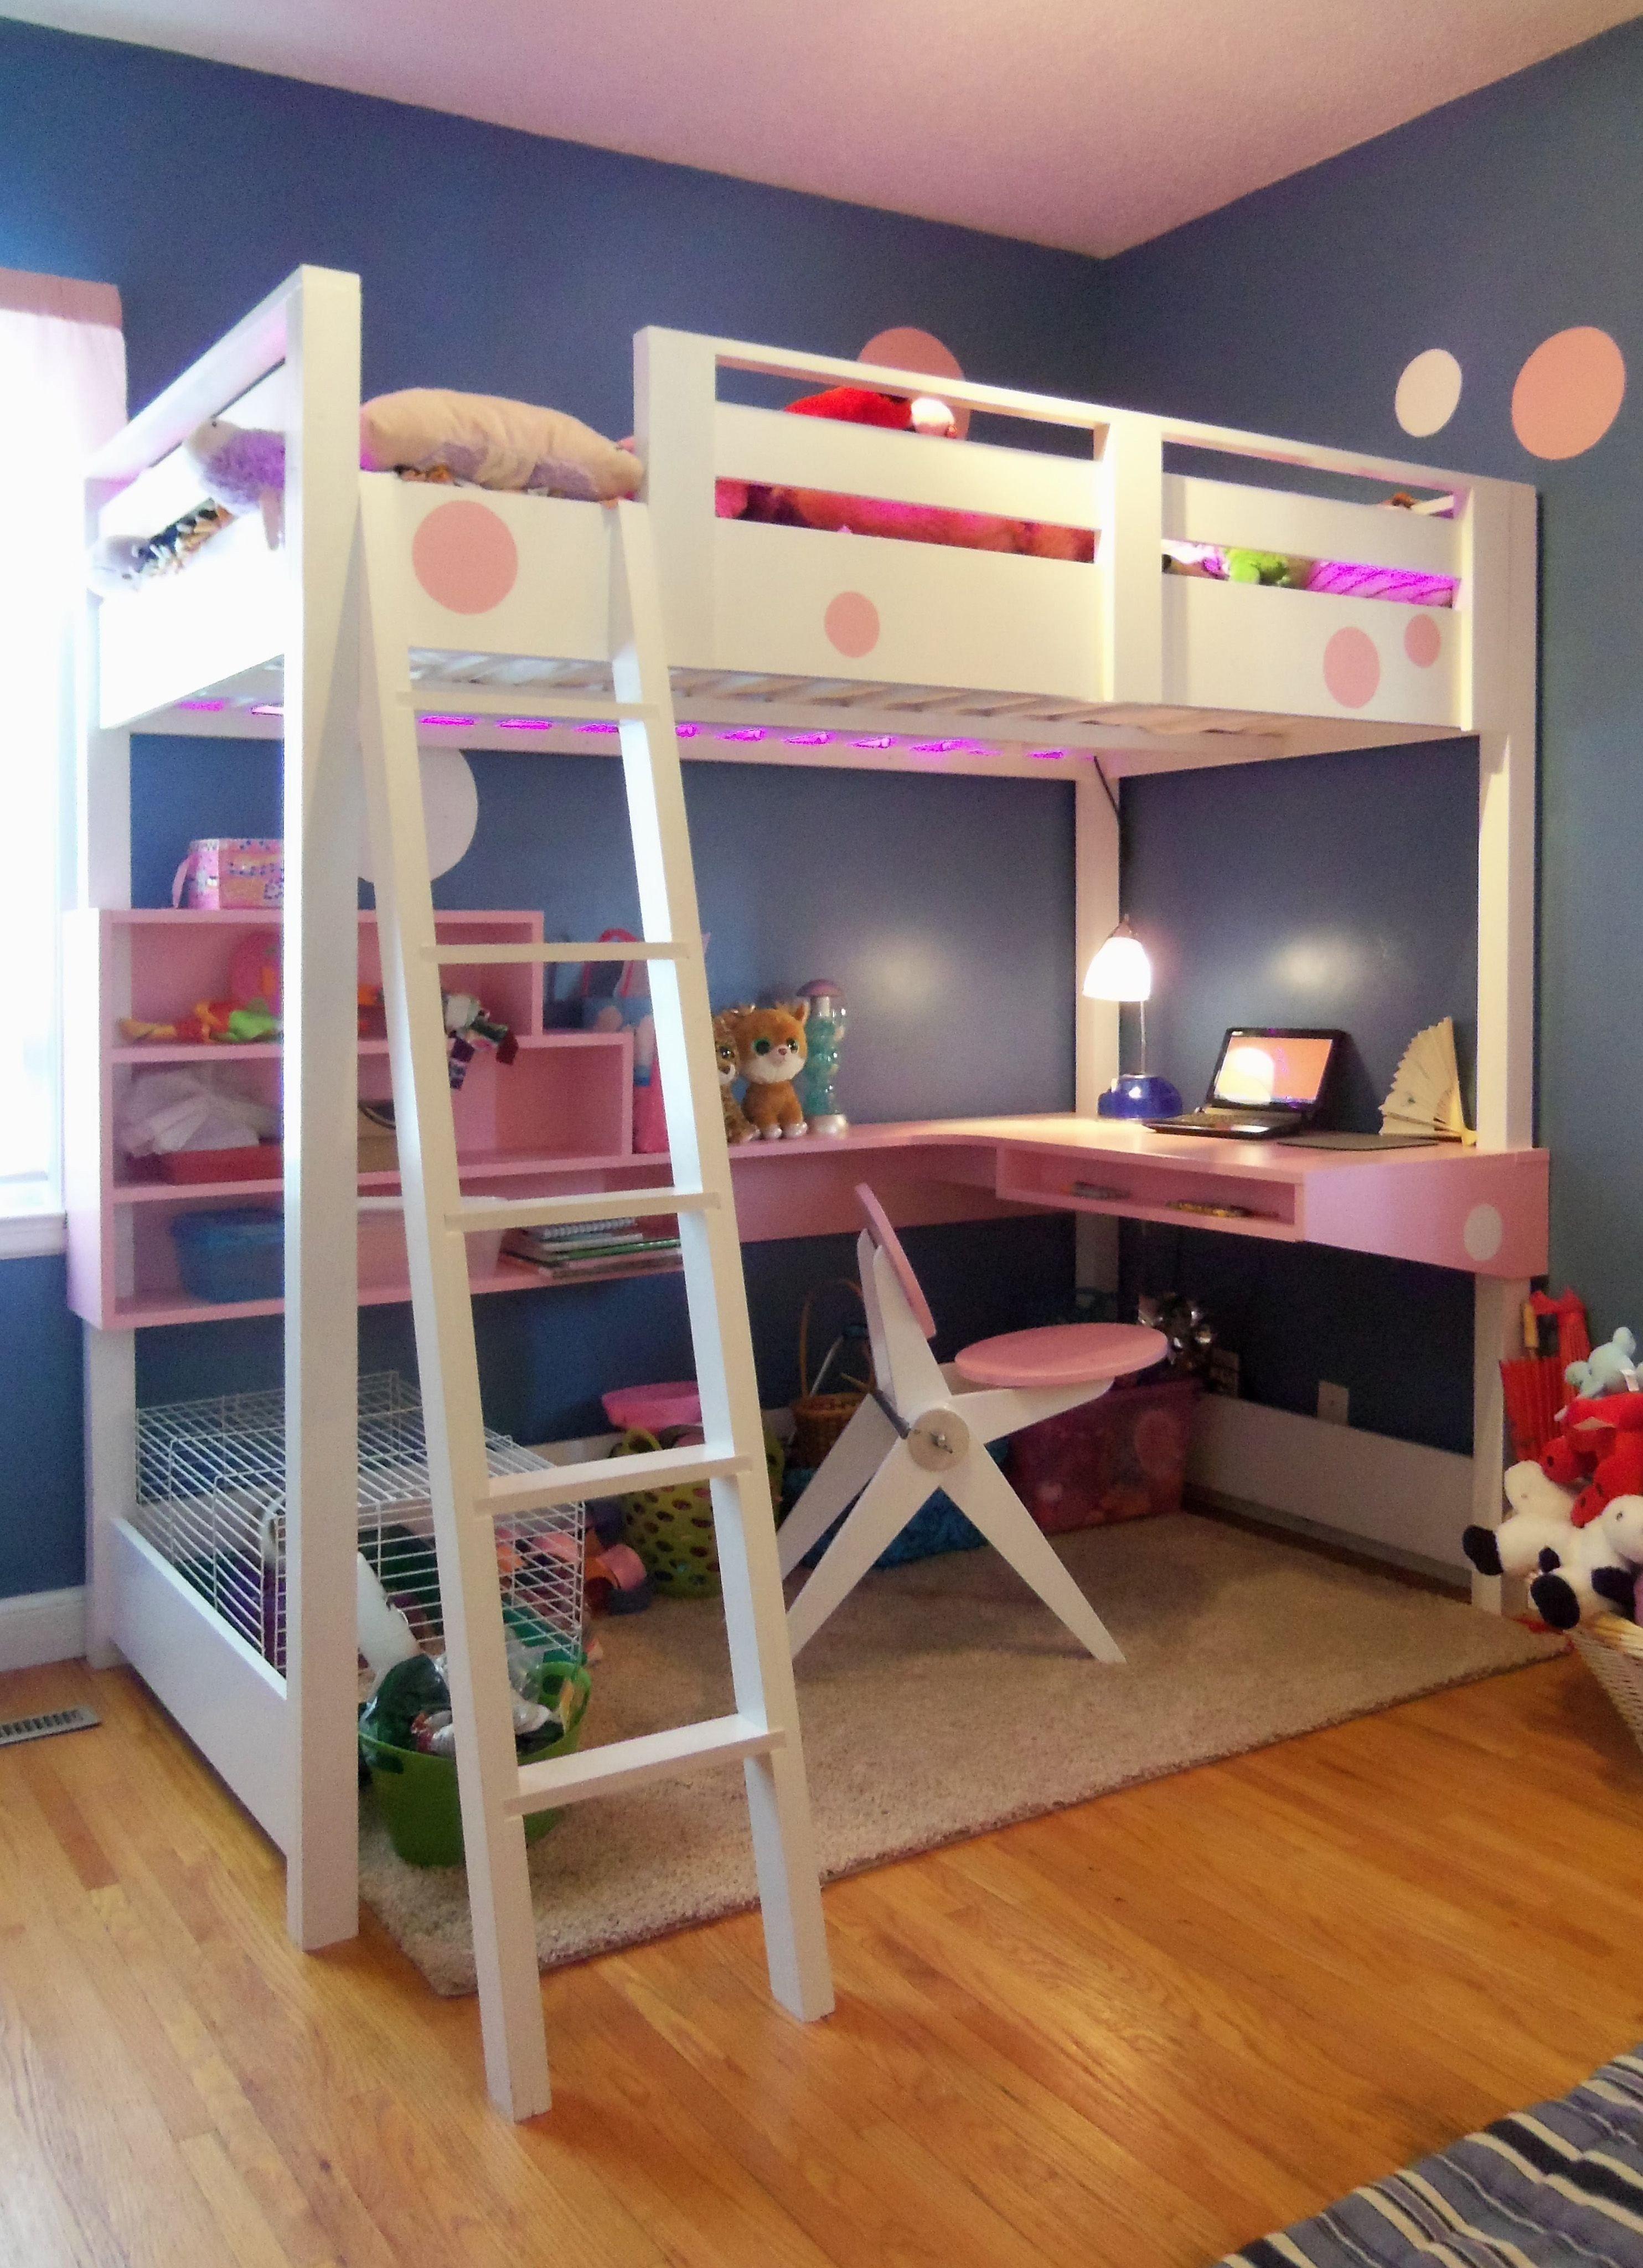 Loft Bed Bedroom Ideas Elegant Loftbed Storage Ideas Loft Bed with Desk